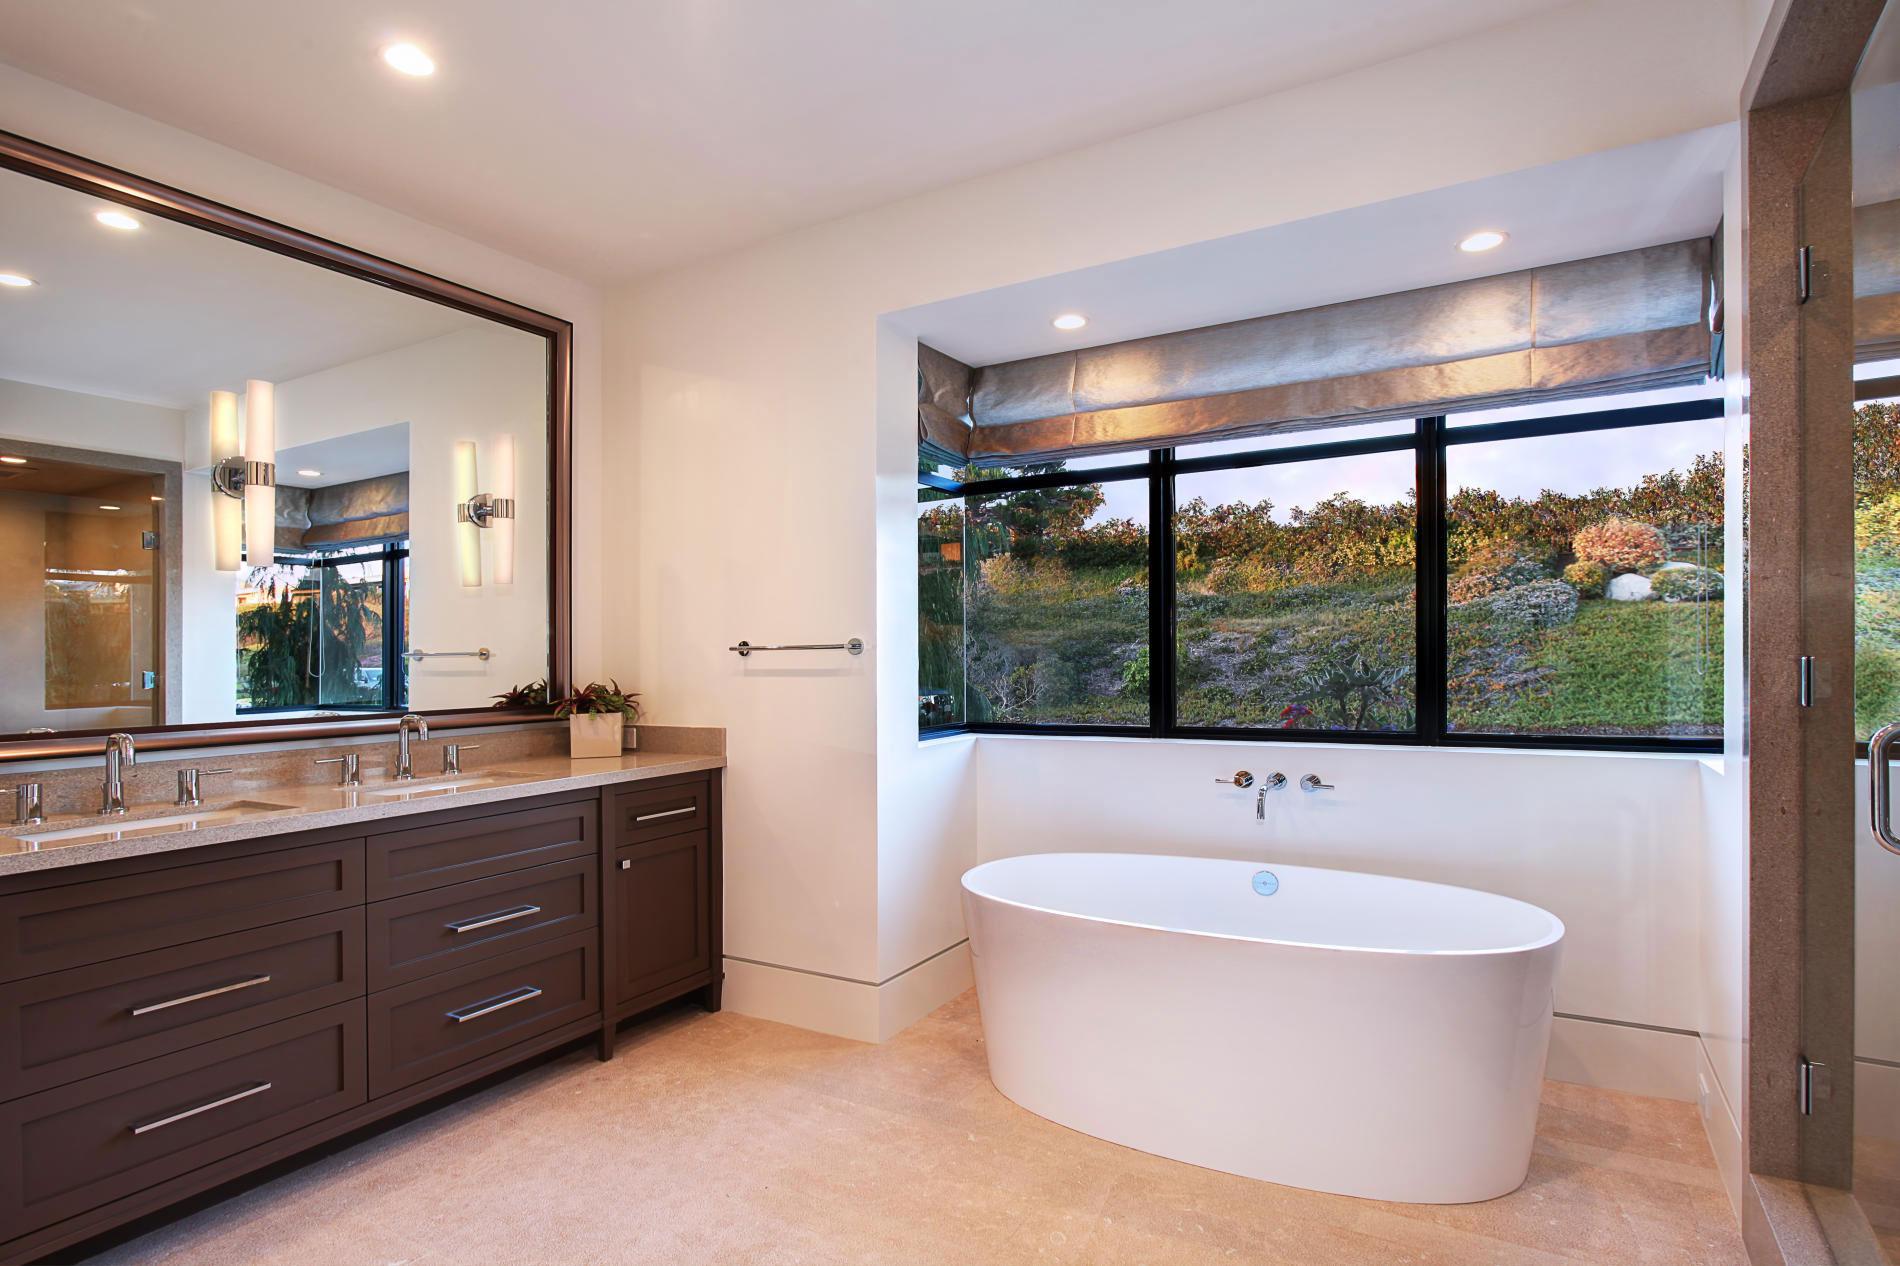 Bathroom Mirror, Sinks, Bath, Home in Corona del Mar, California